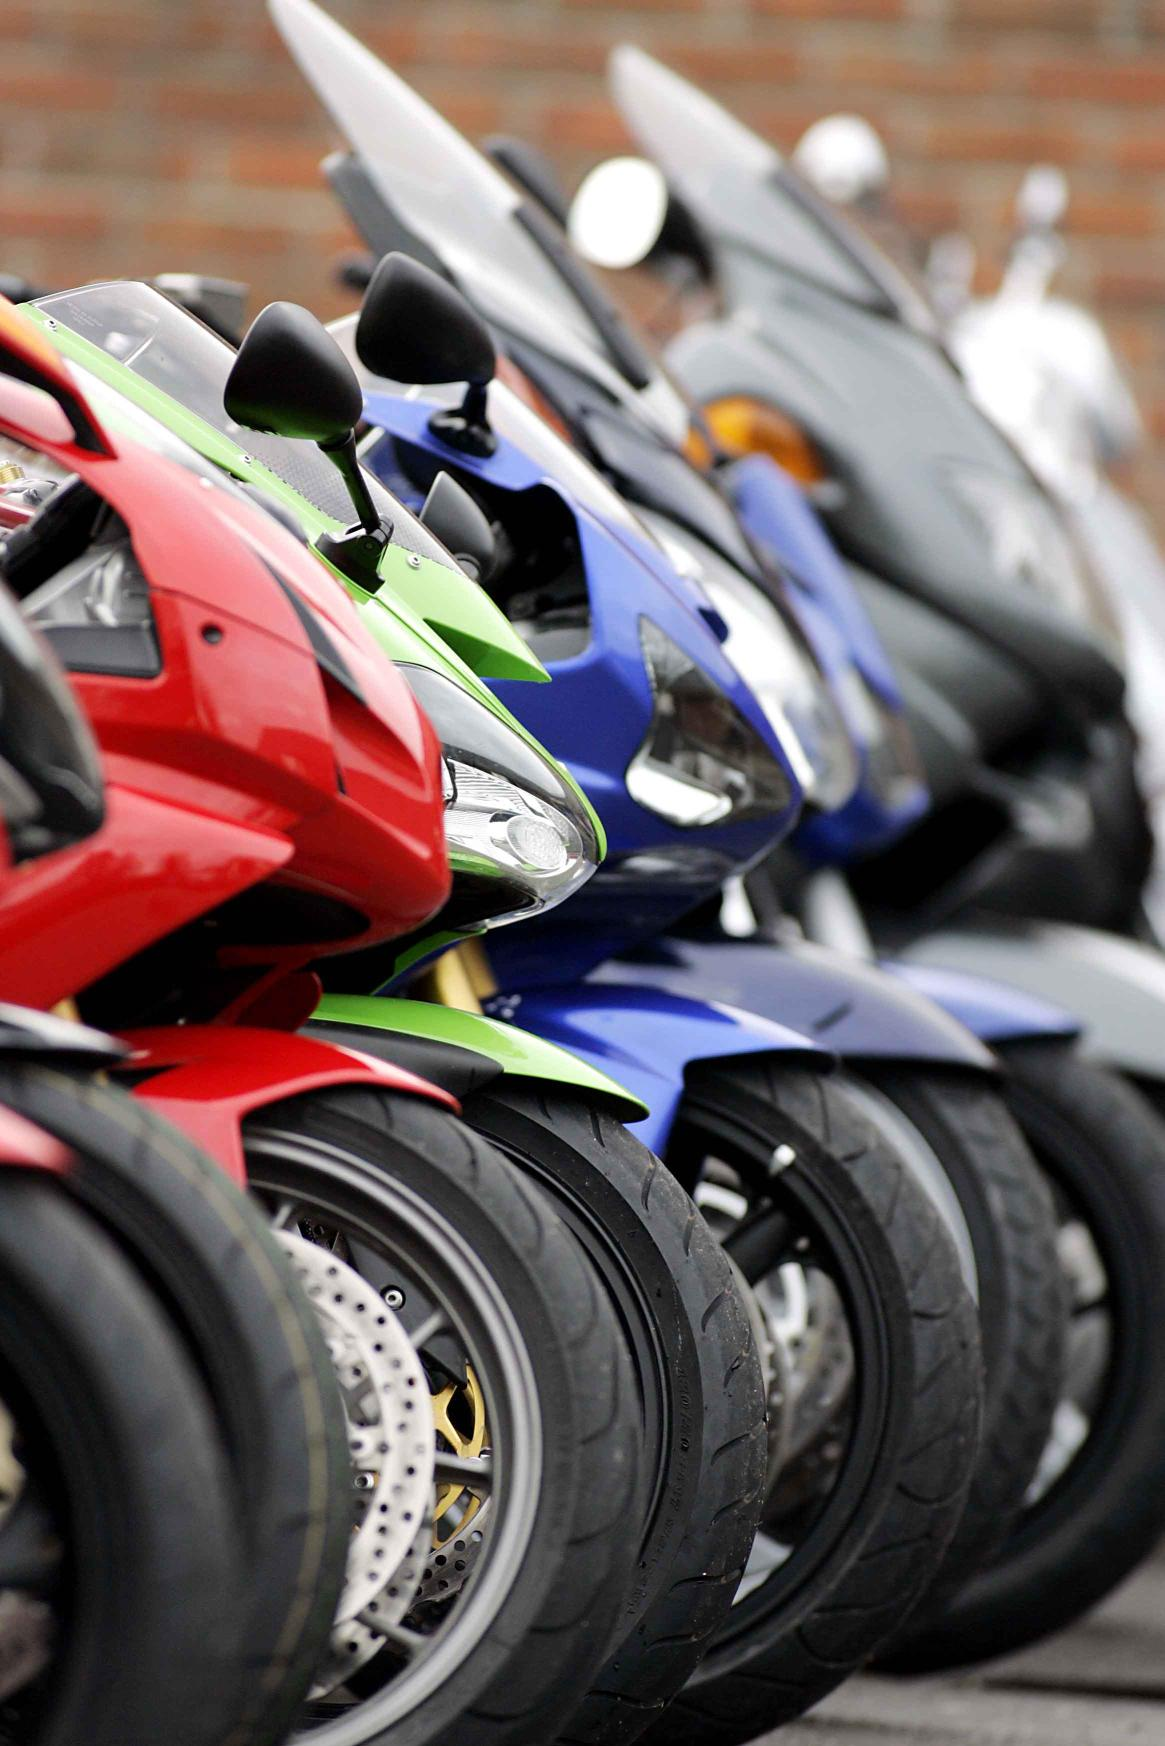 Motorcycle sales soar - MCIA